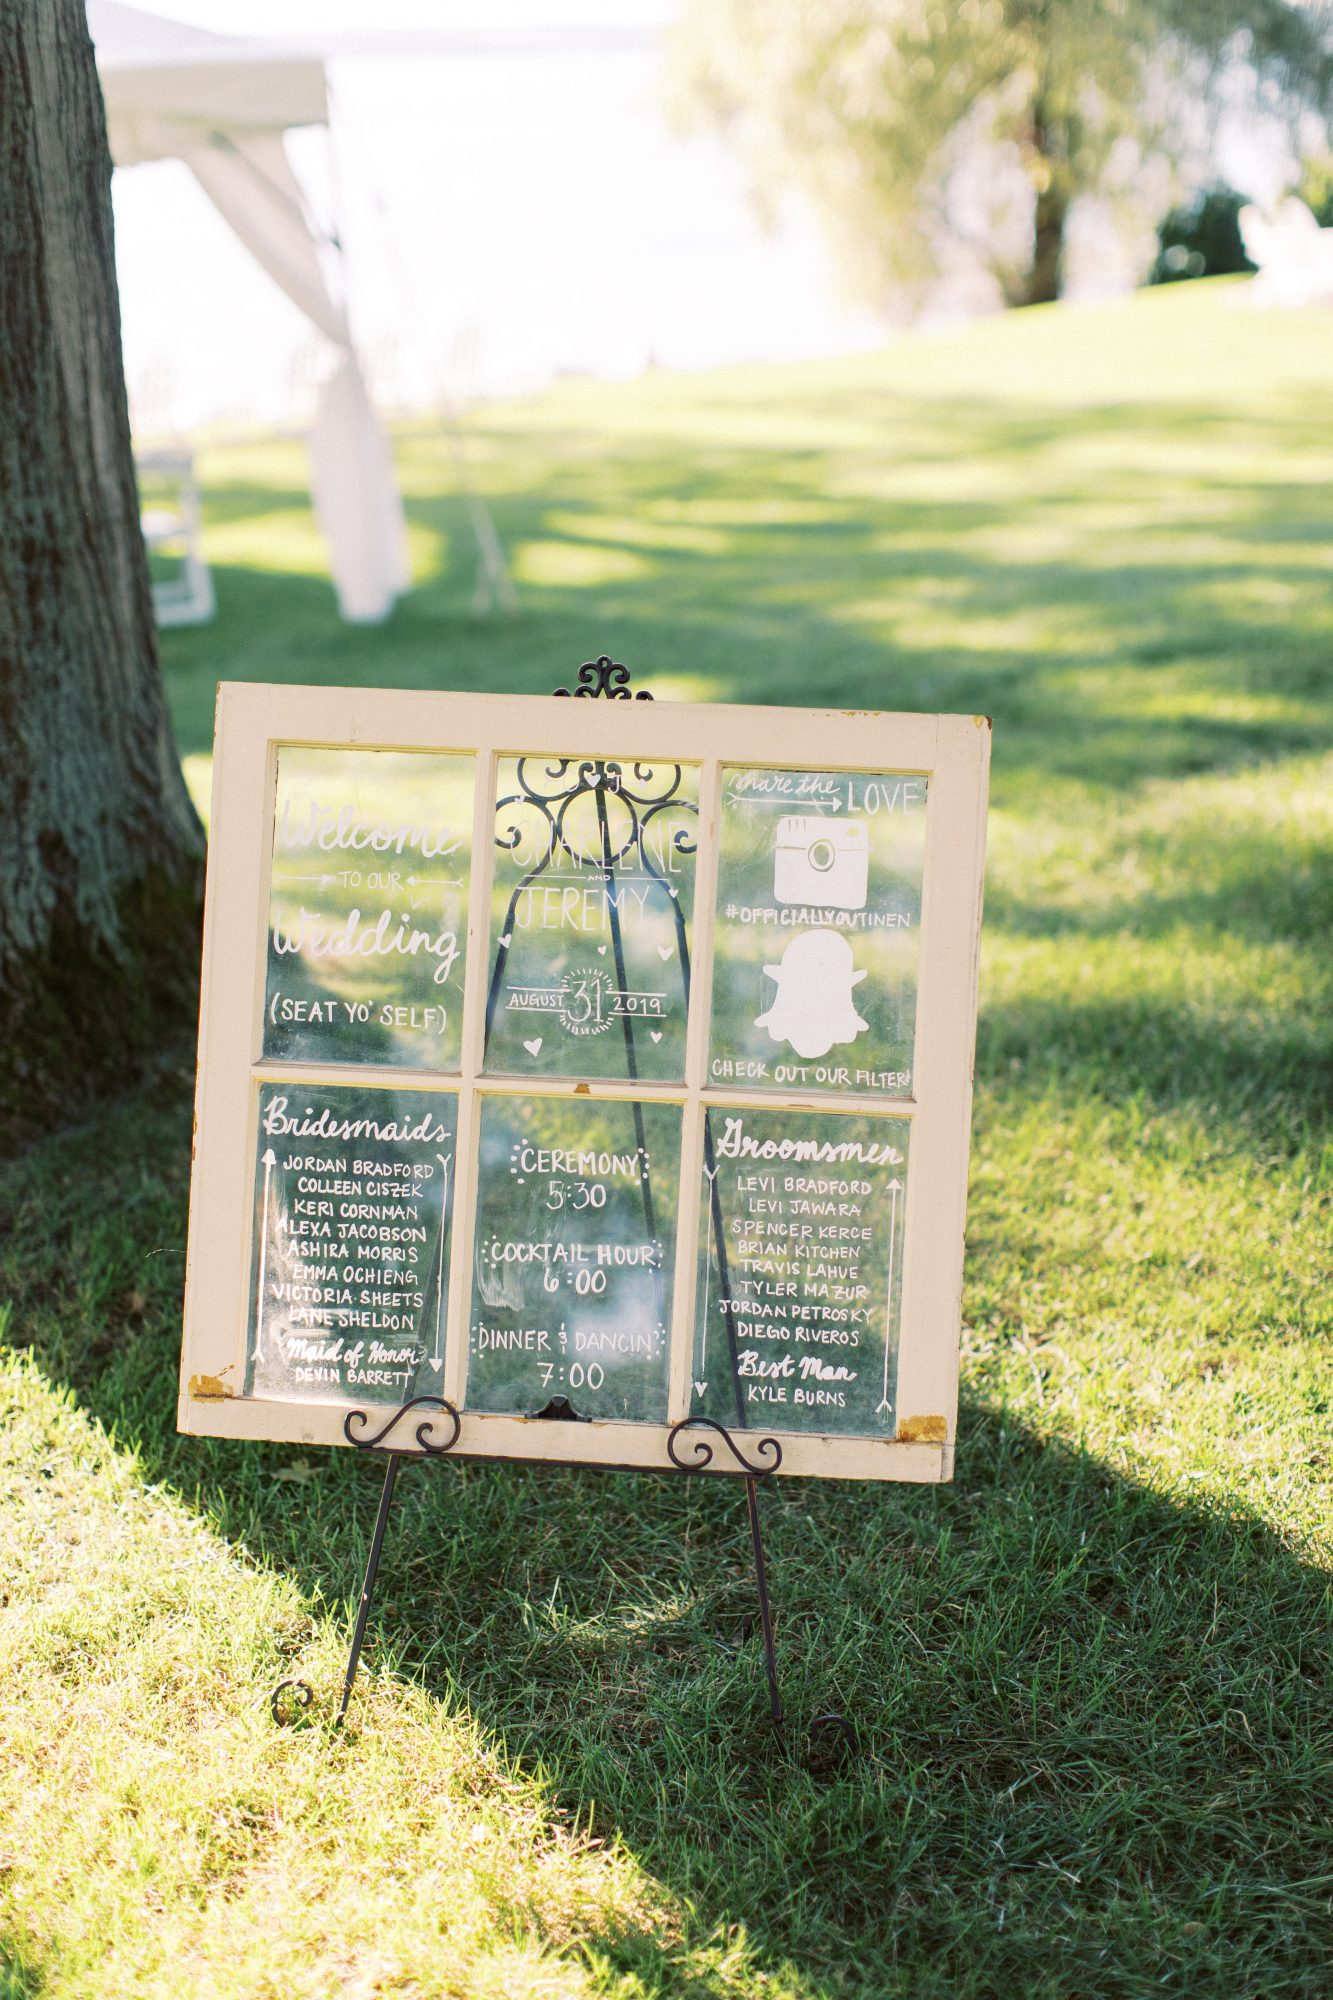 charlene jeremy wedding sign with windowpane design